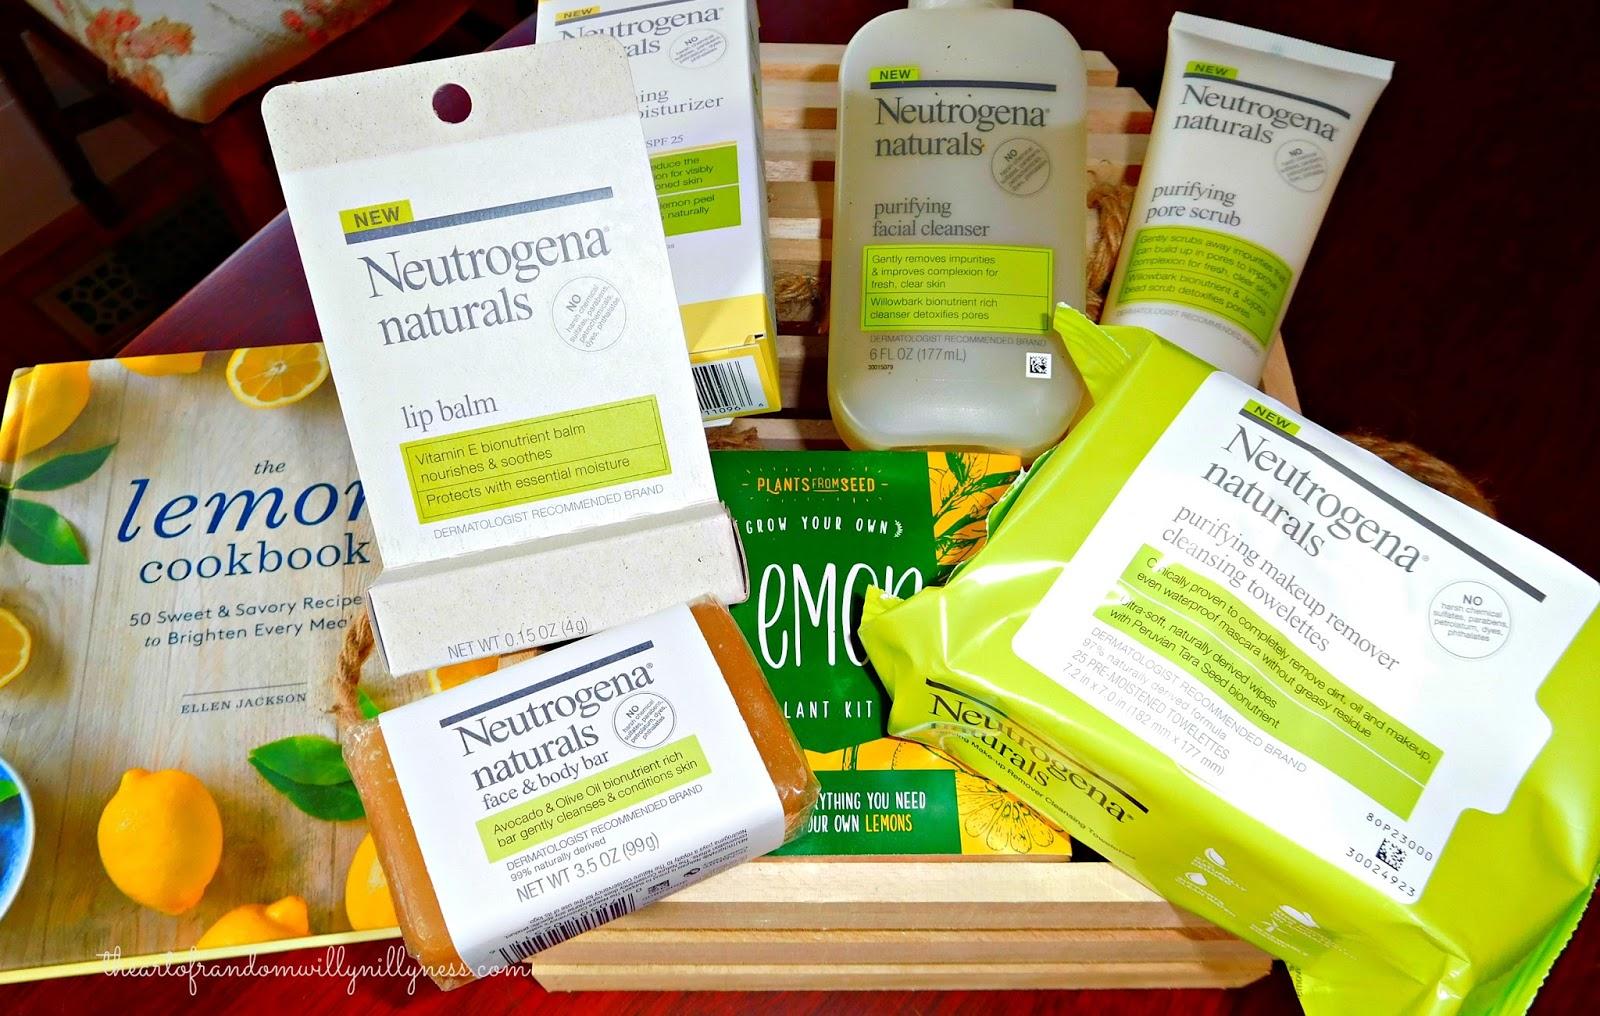 Neutrogena Naturals Face Wash Bad For You